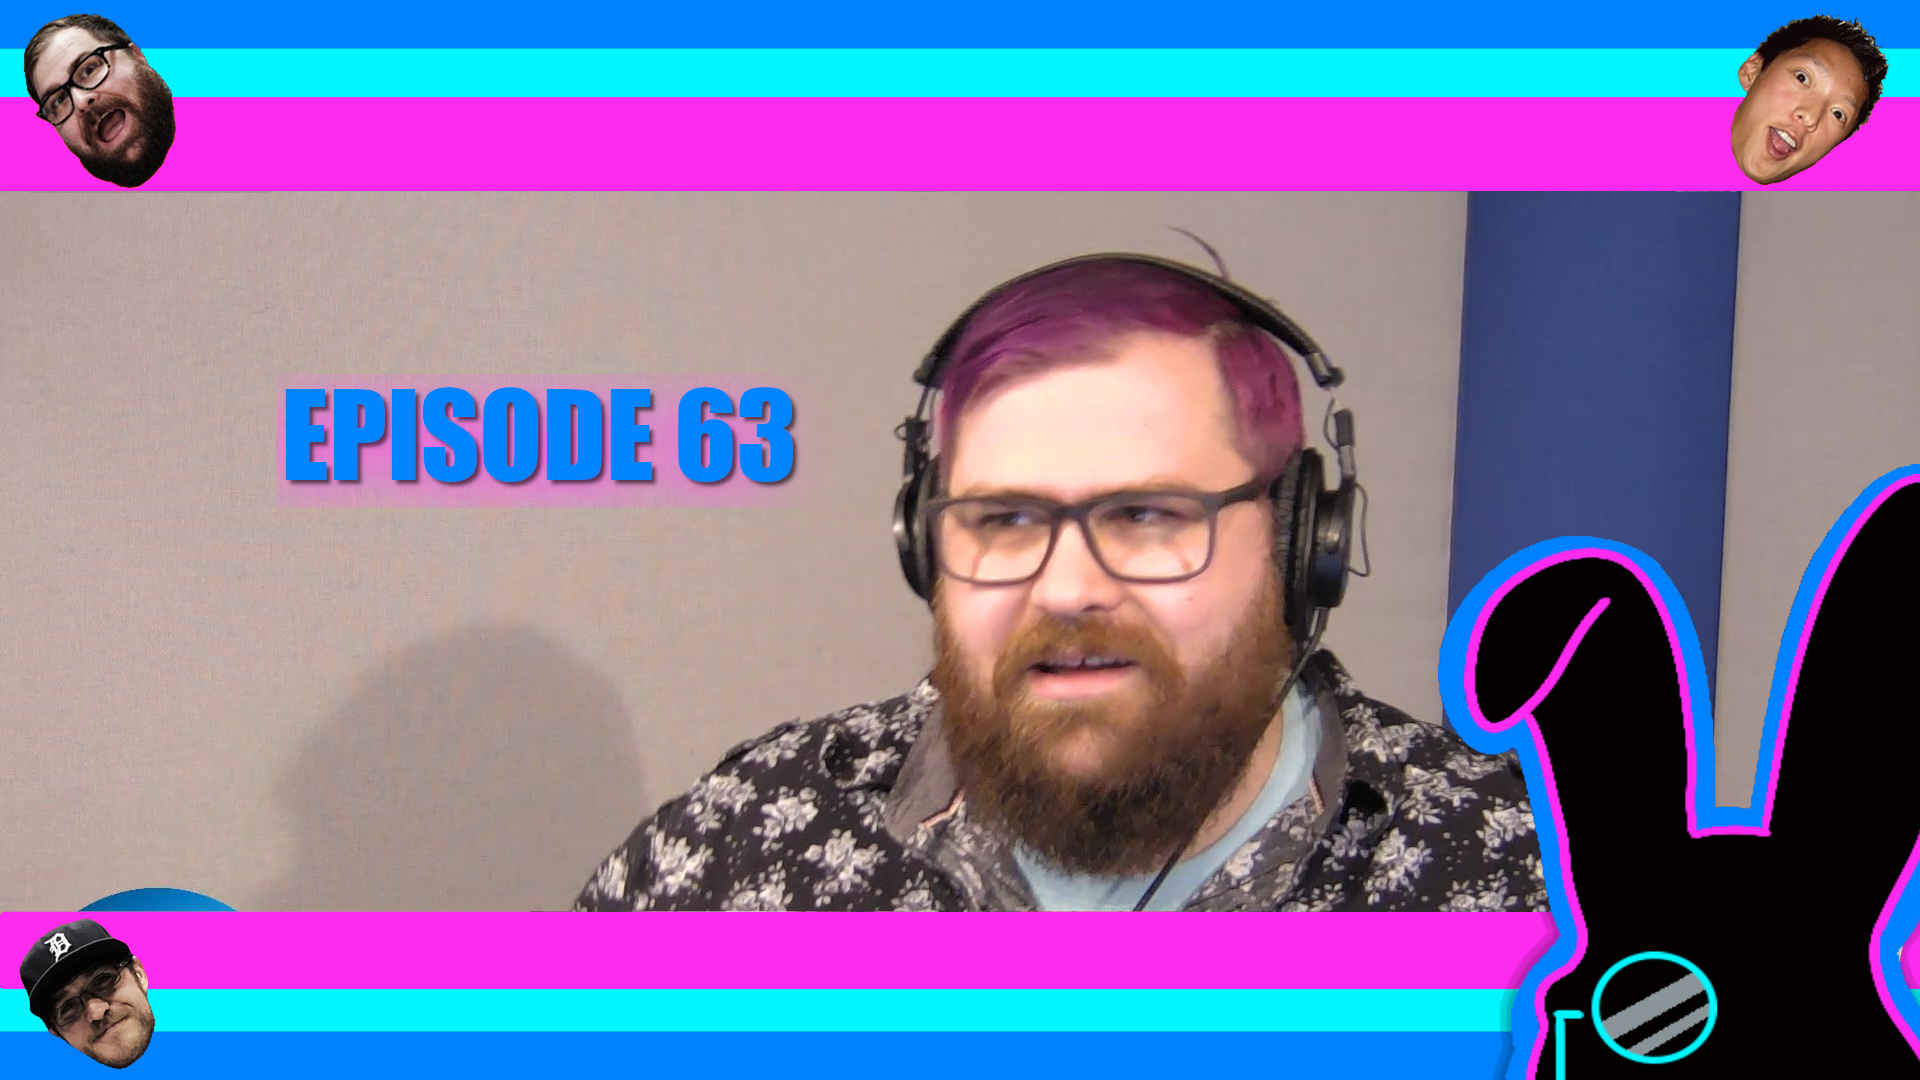 Geektainment Weekly - Episode 63